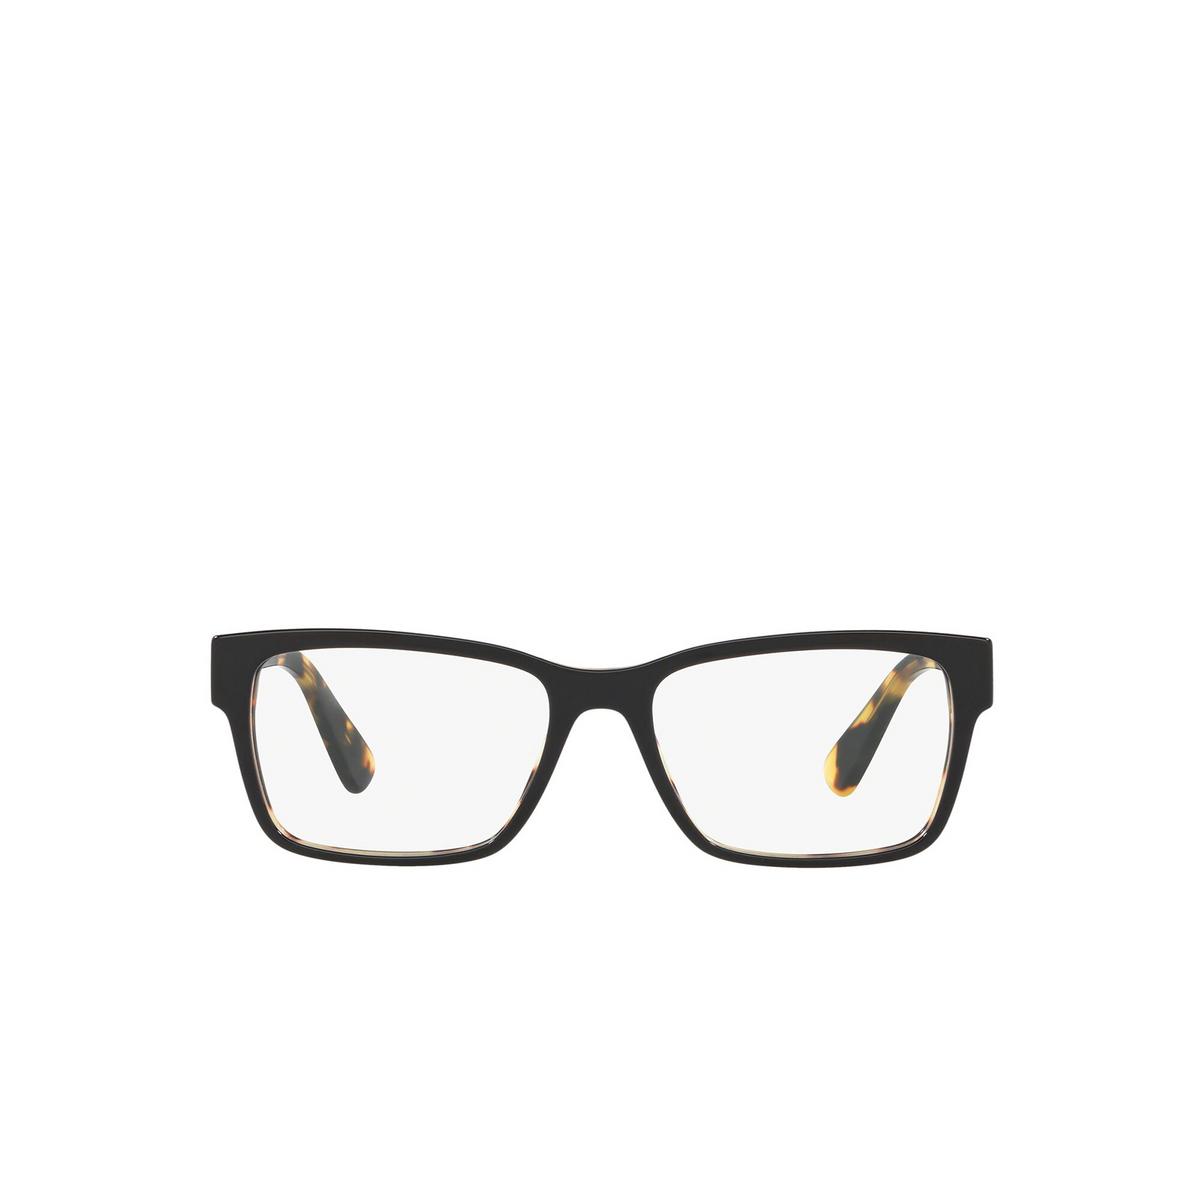 Prada® Rectangle Eyeglasses: Heritage PR 15VV color Top Black / Medium Havana NAI1O1 - front view.